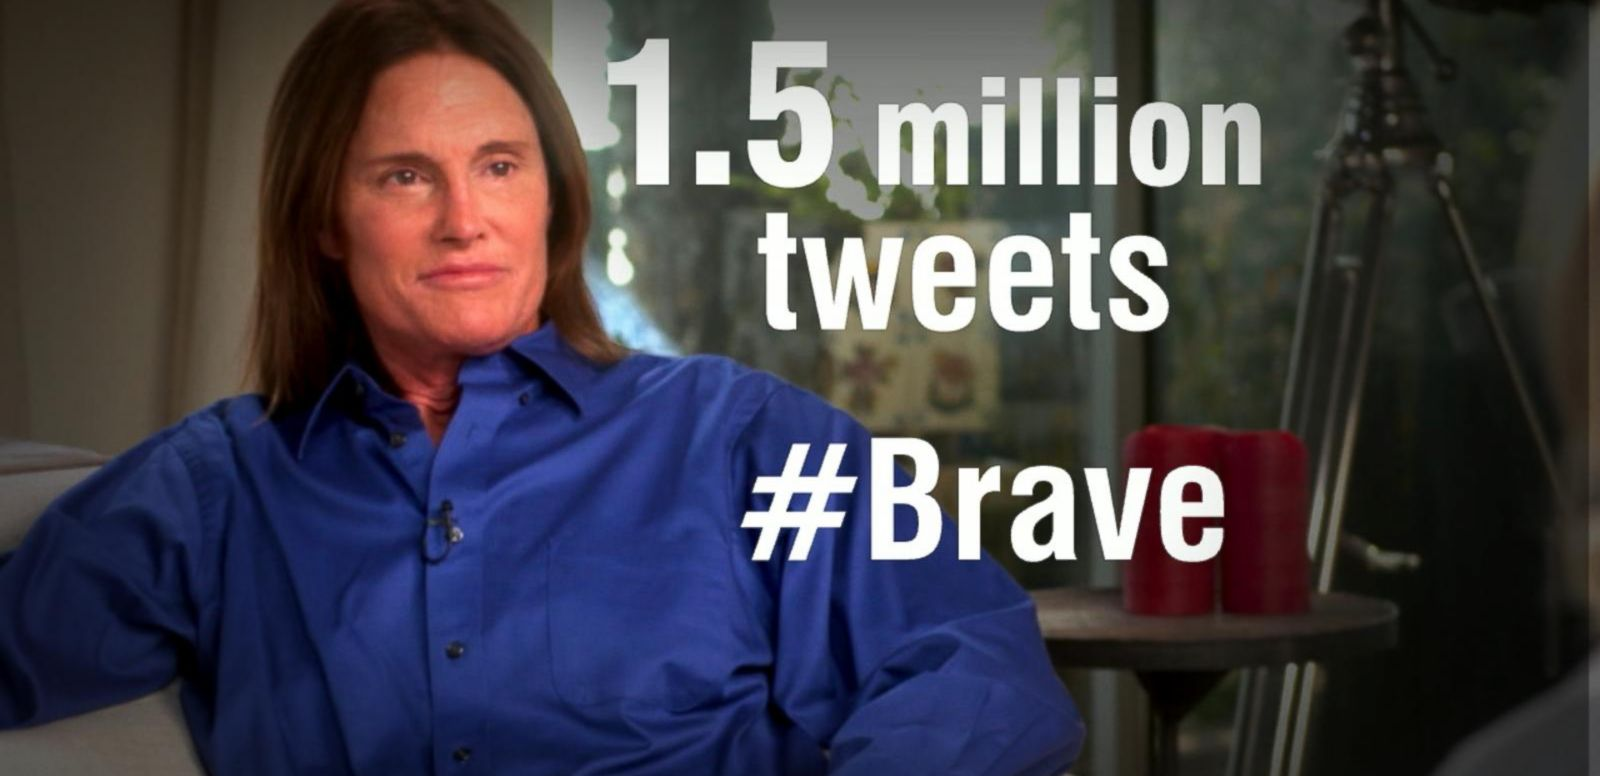 Bruce Jenner Interview Sparks a National Debate